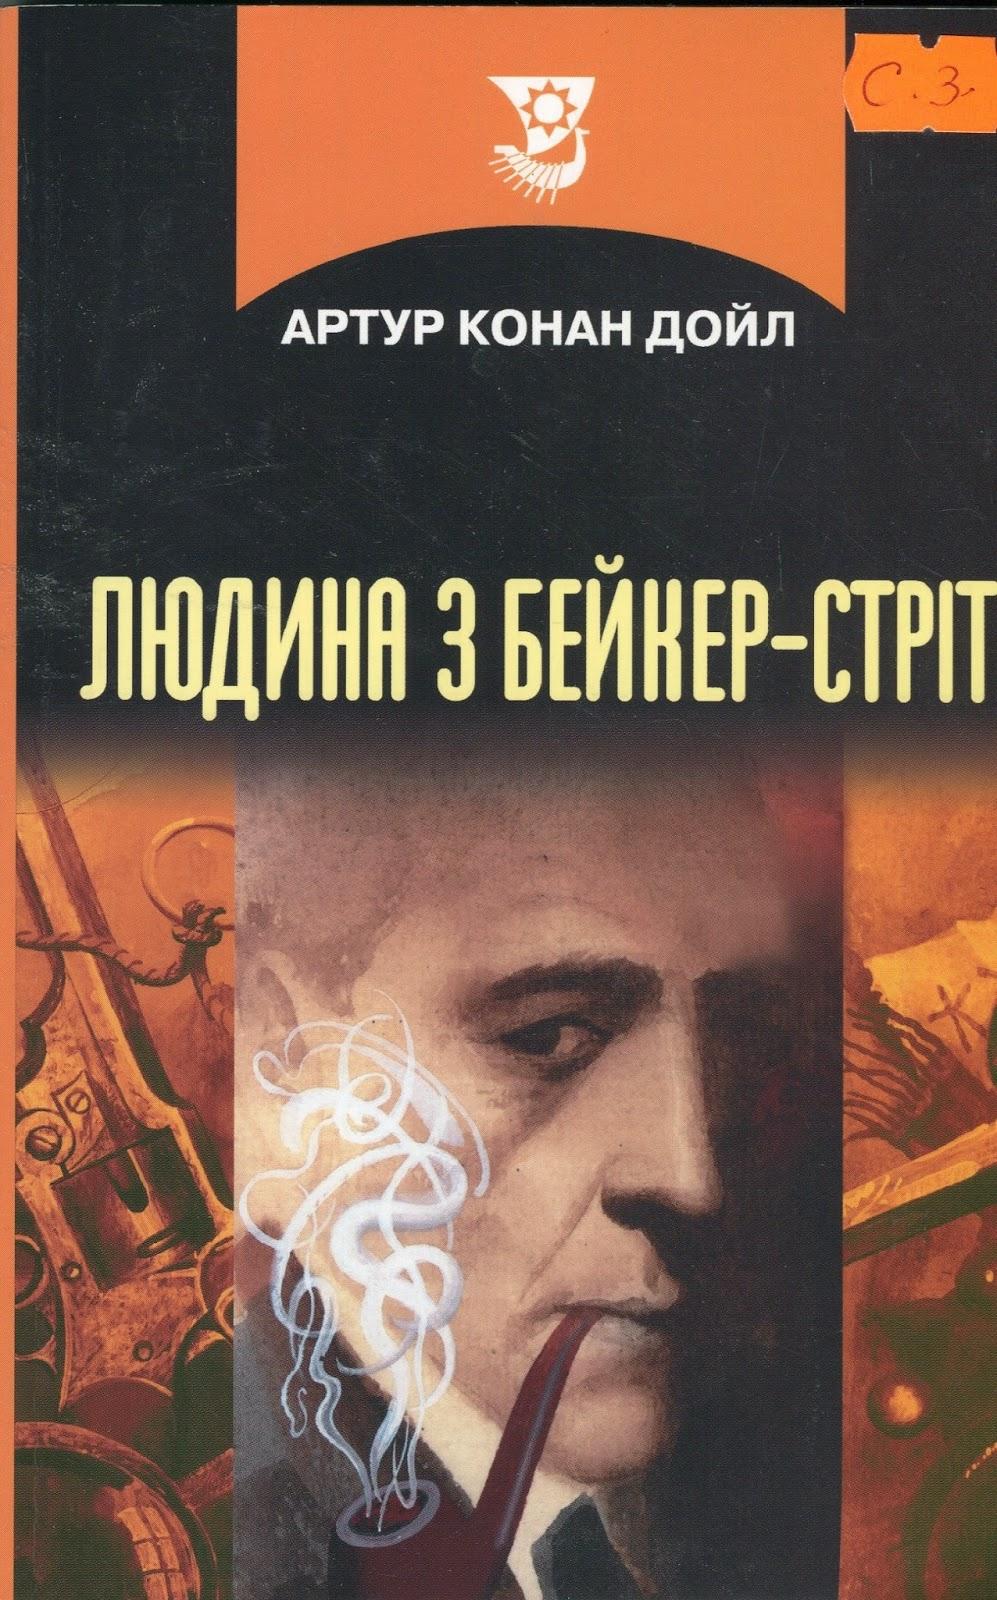 Сериалы жанра Биография  fasttorrentru